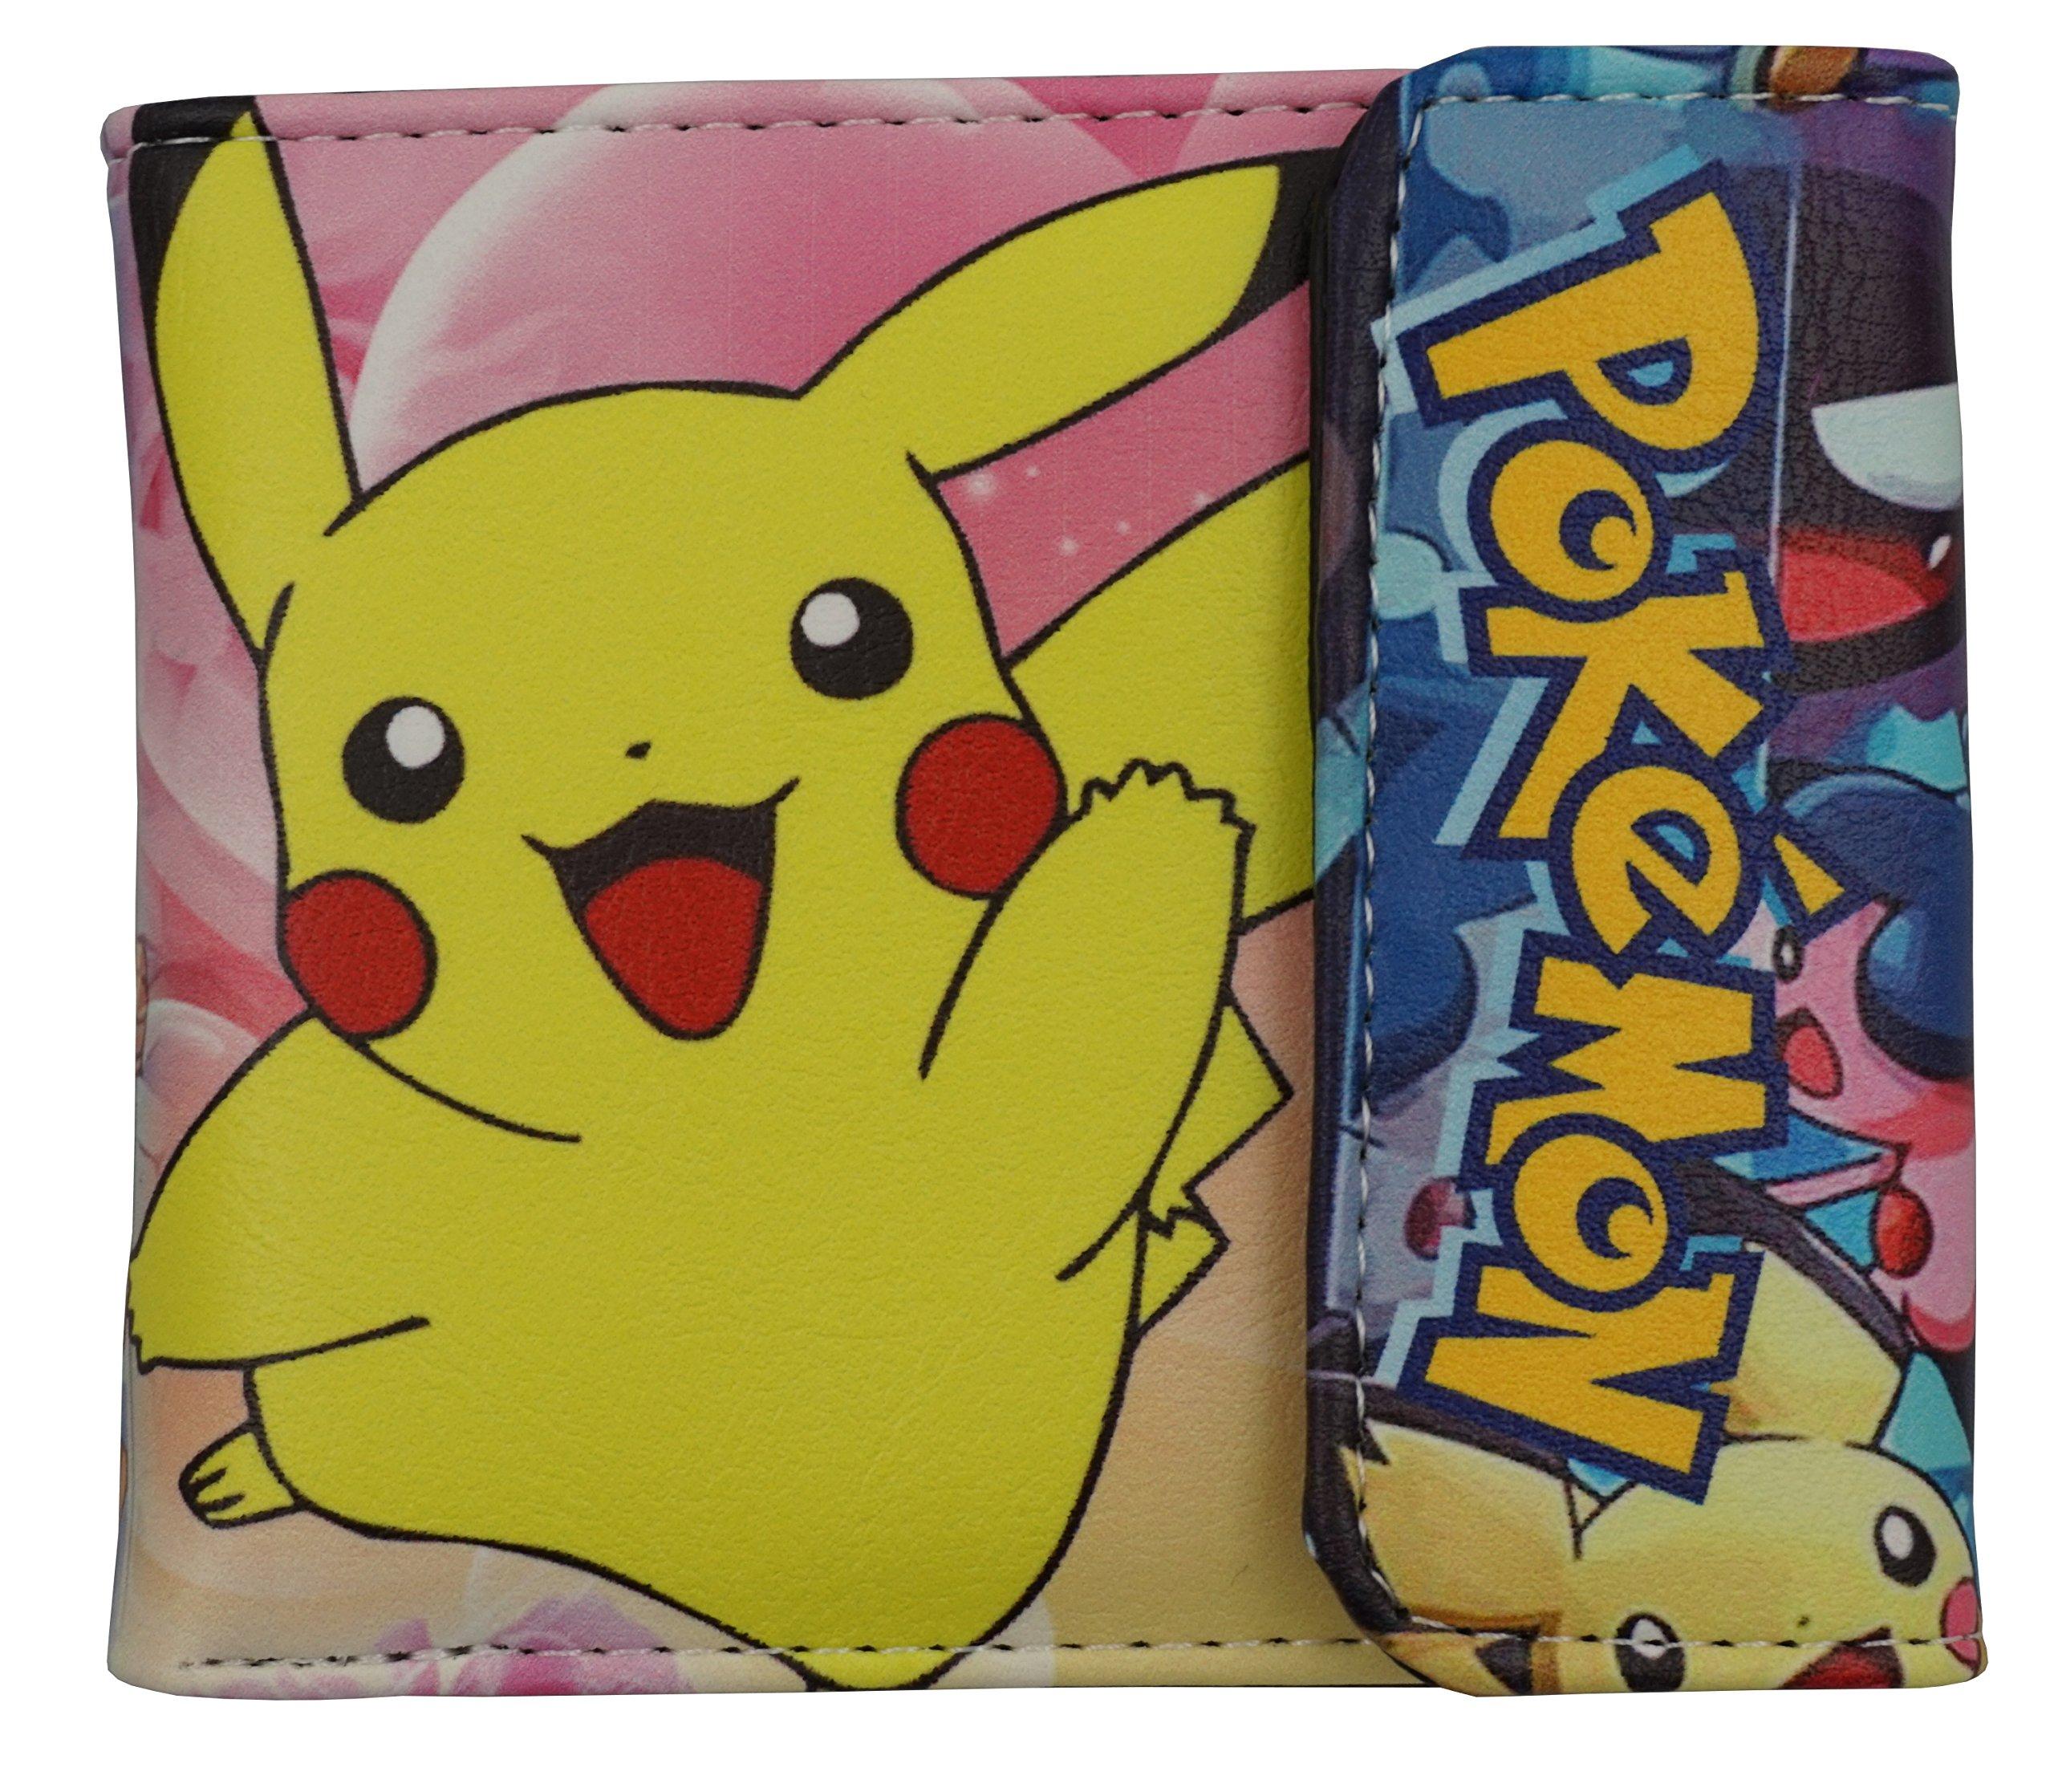 Pokemon wallet - Pikachu (Pikachu and Friends)